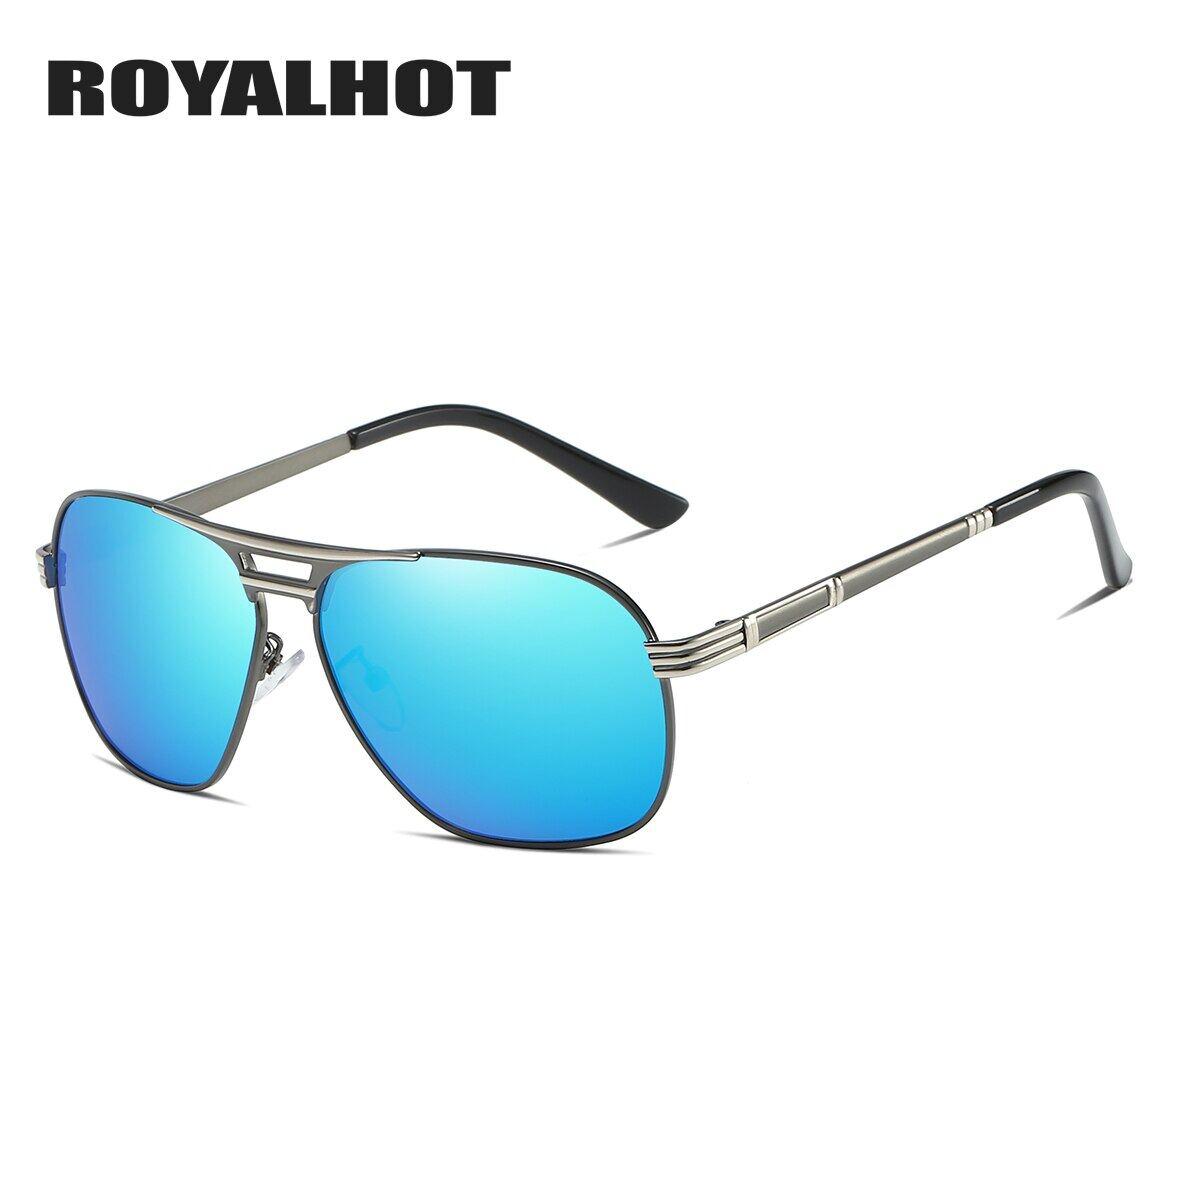 Men Women Polarized Sunglasses Oval Aloy Frame Sun Glasses Driving Glasses Shades Oculos Masculino Male 90092